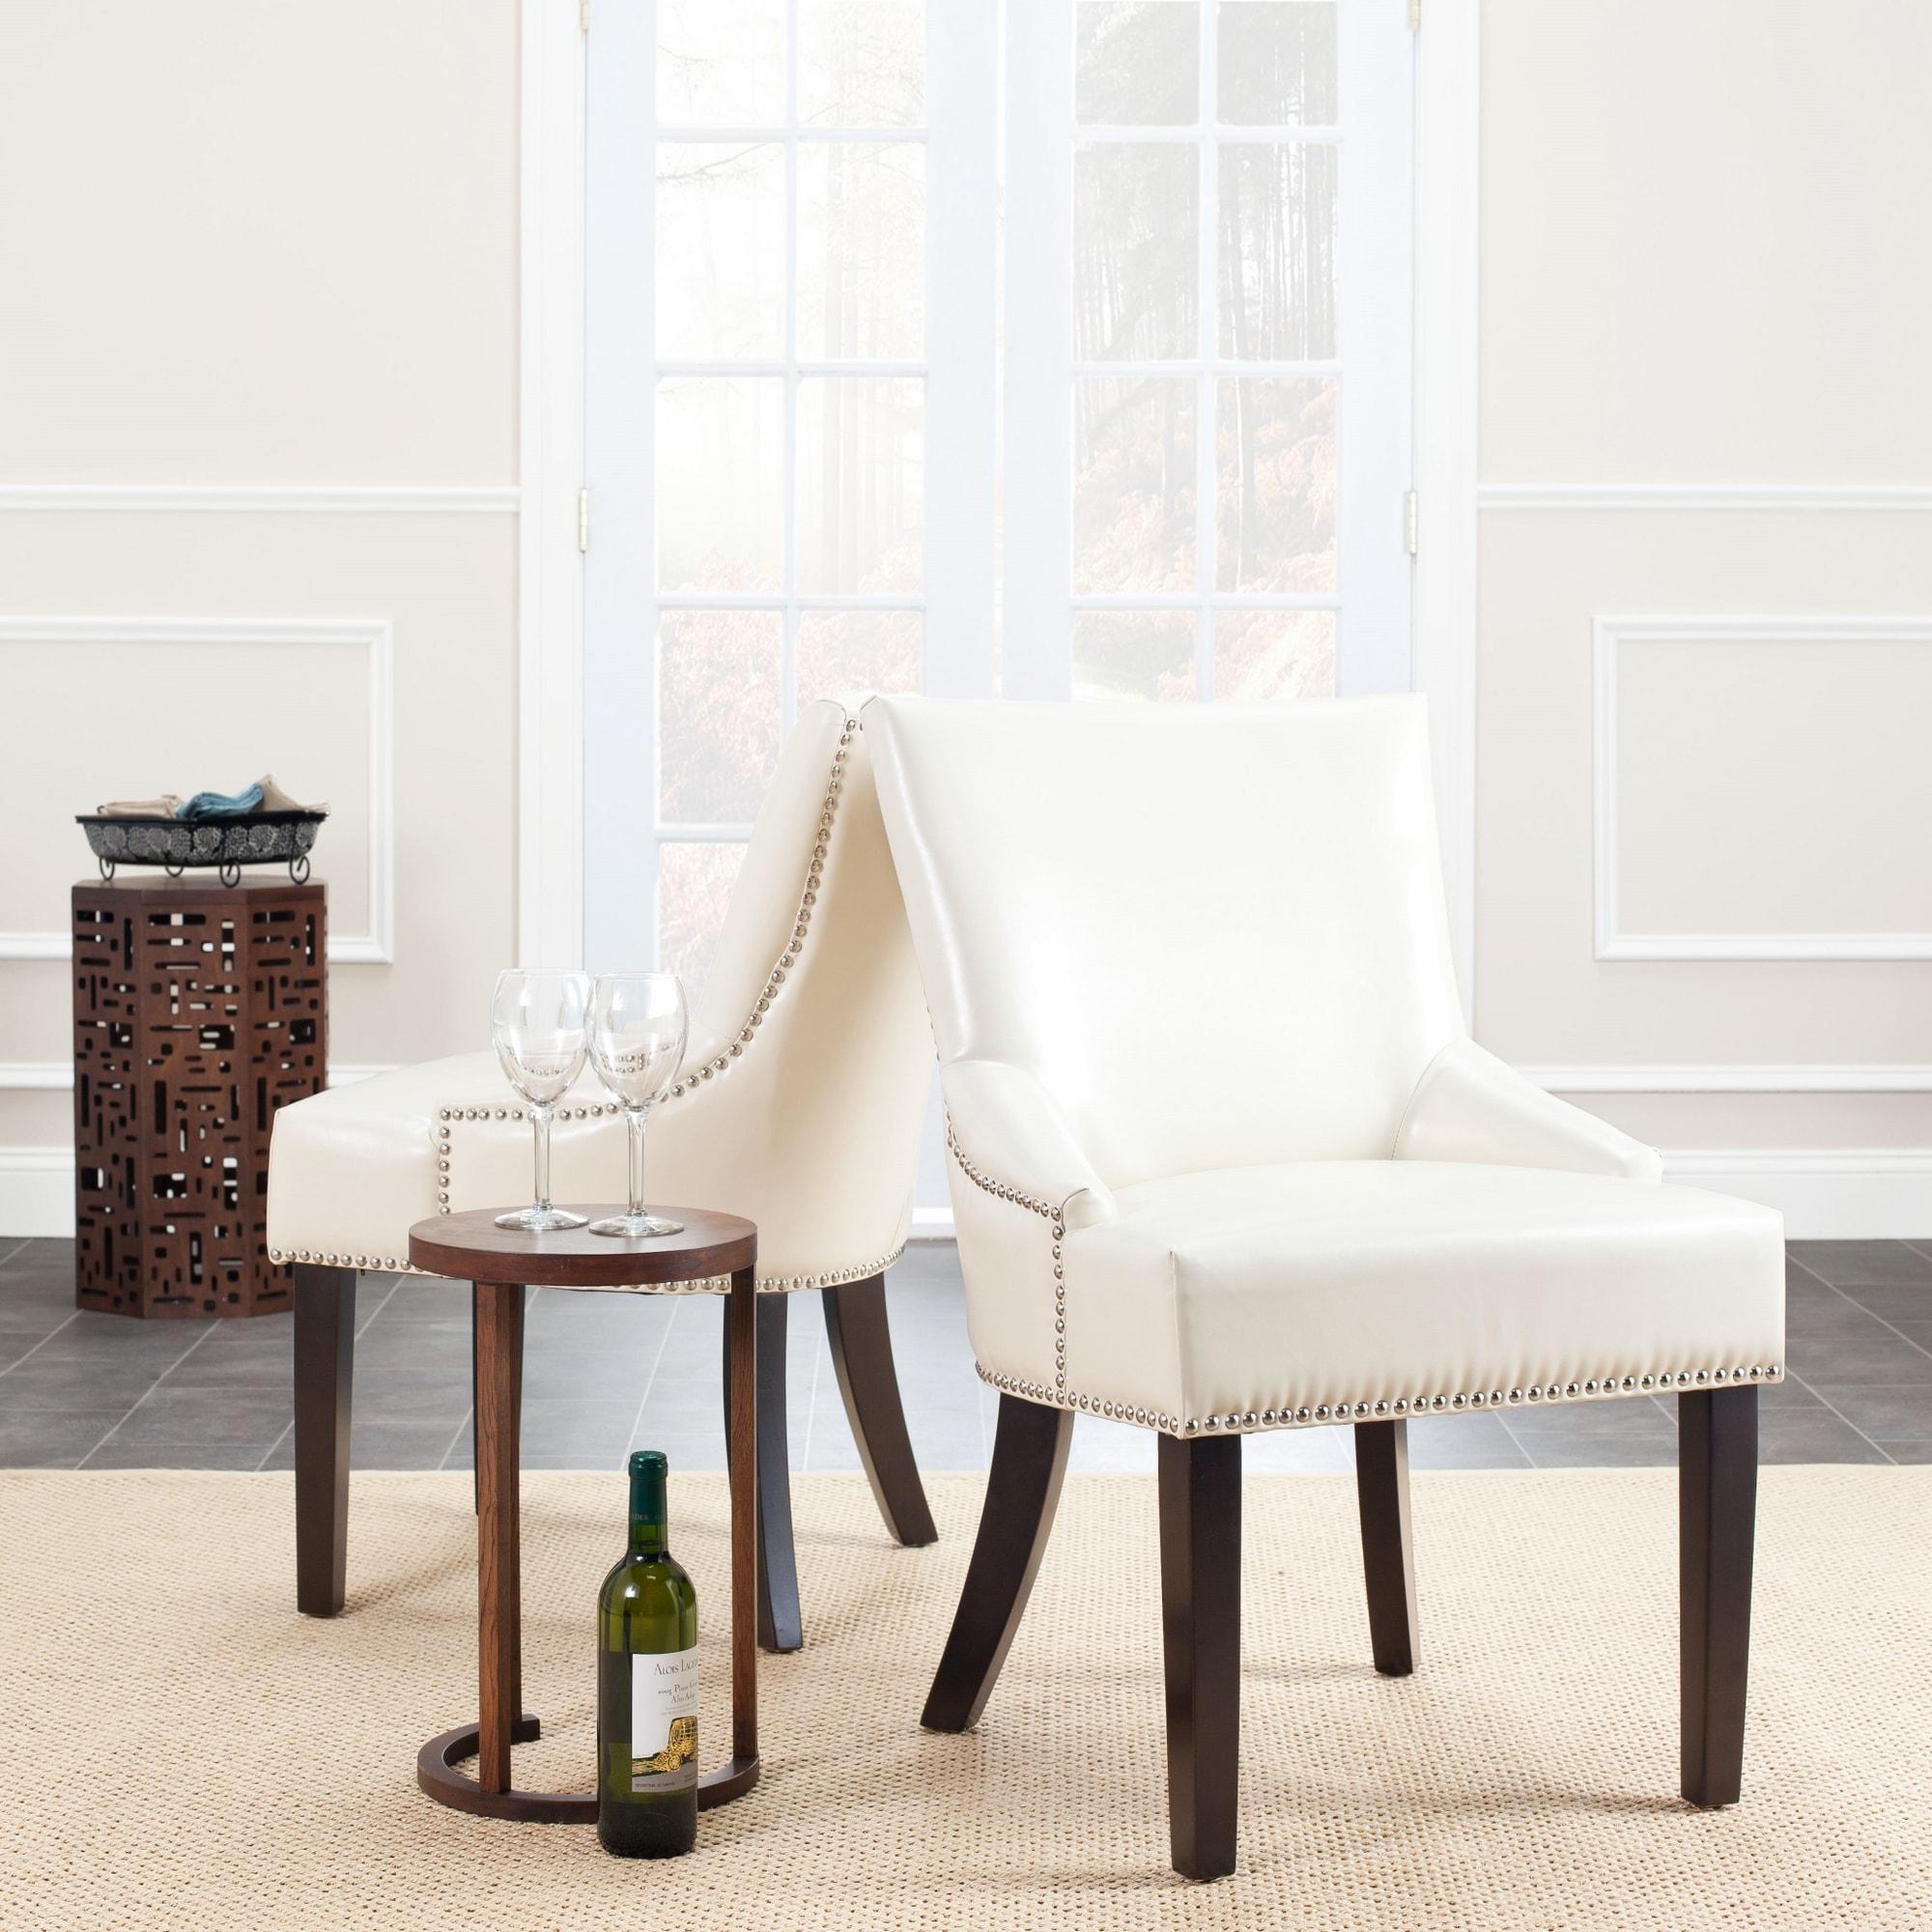 Safavieh Loire Cream Leather Nailhead Dining Chairs (Set